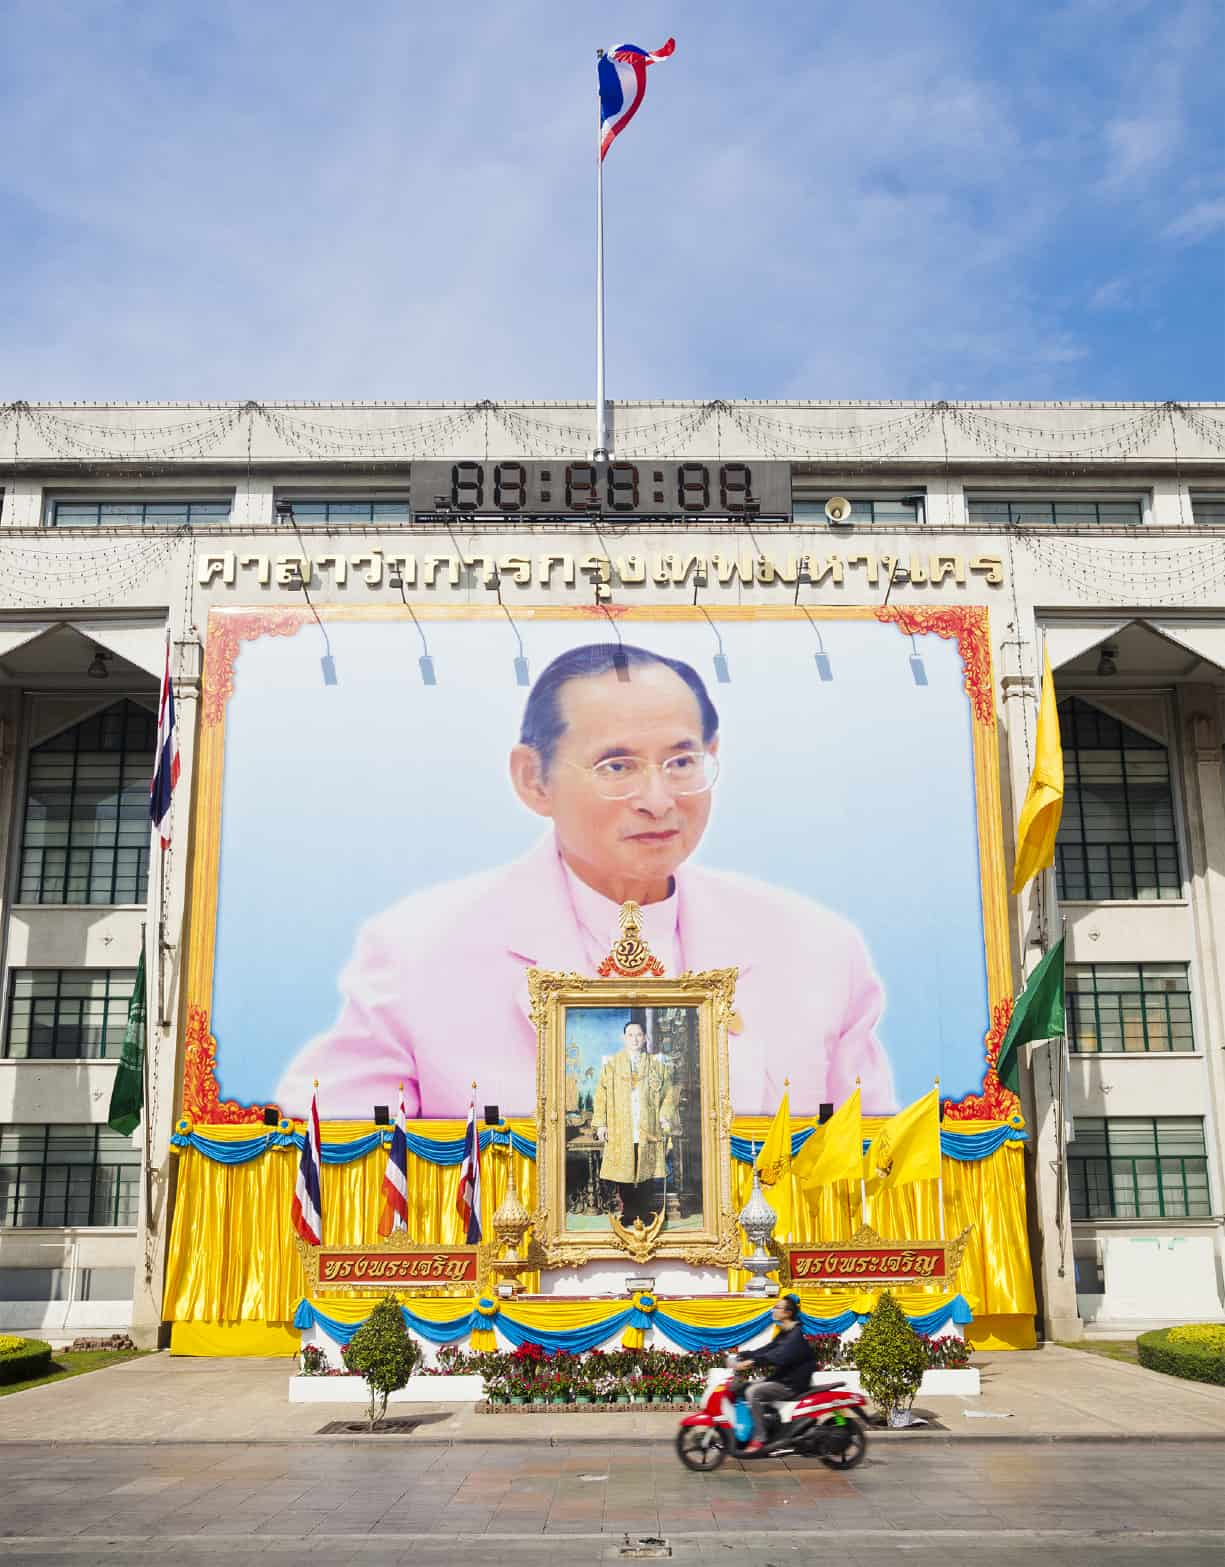 1-King Bhumibol Adulyadej